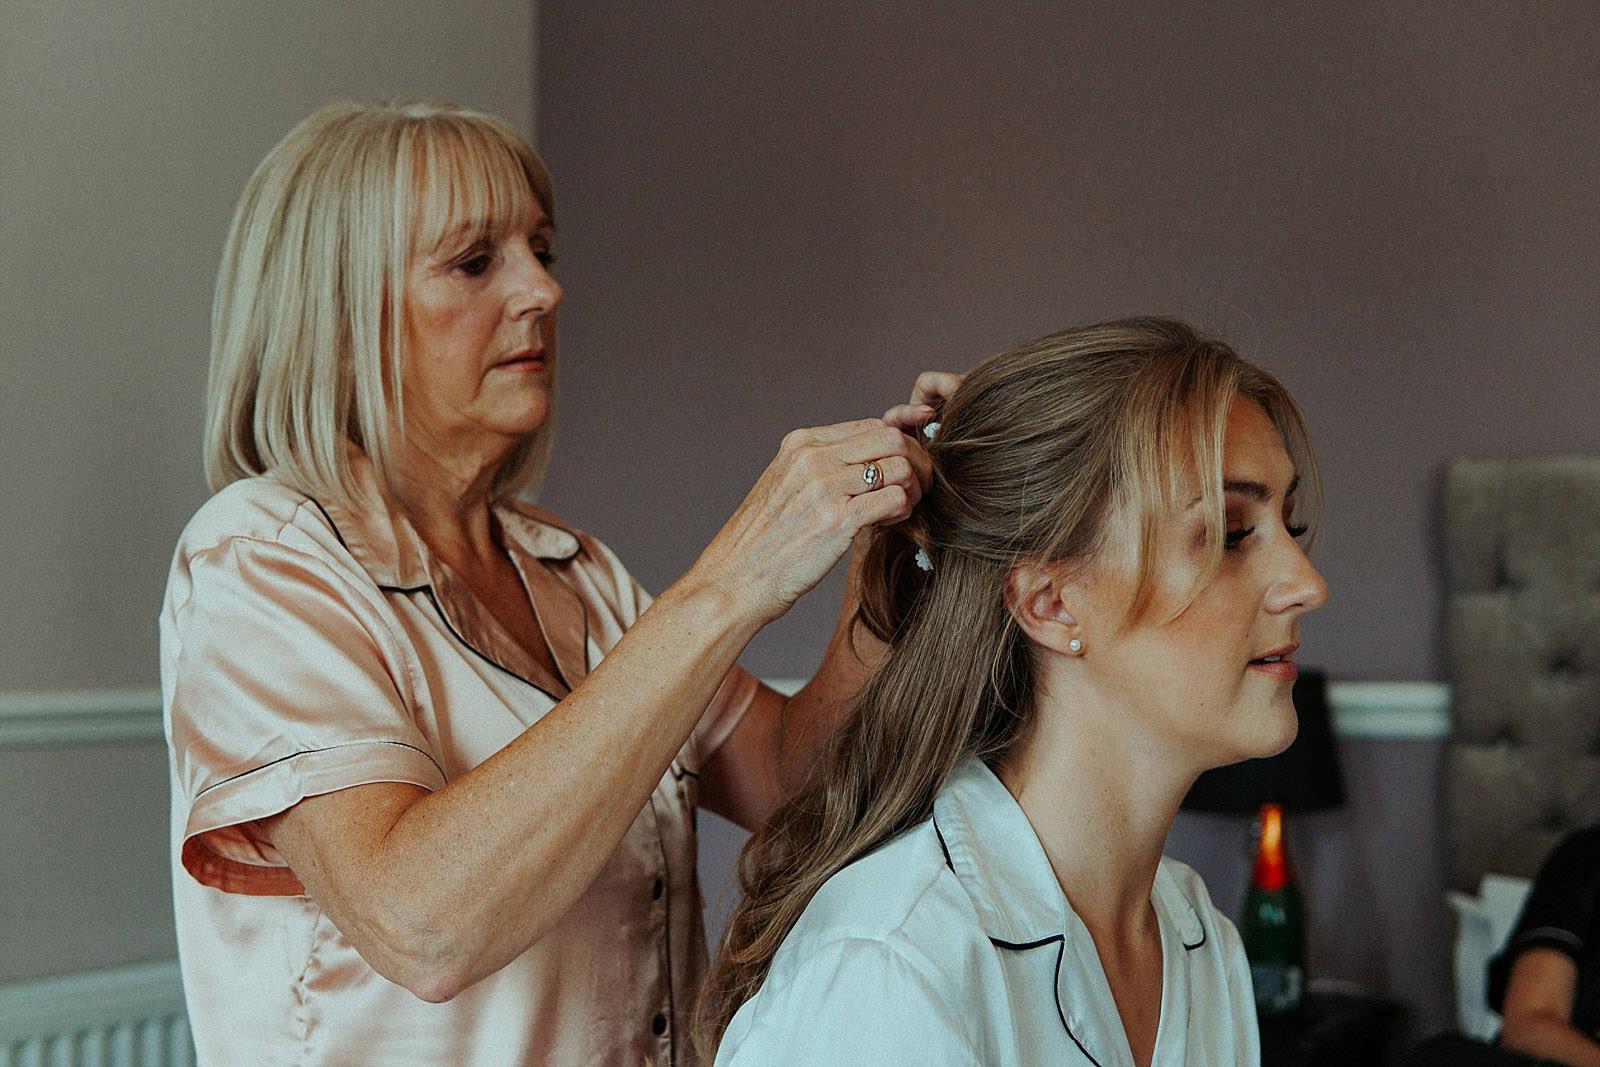 mum doing the brides hair